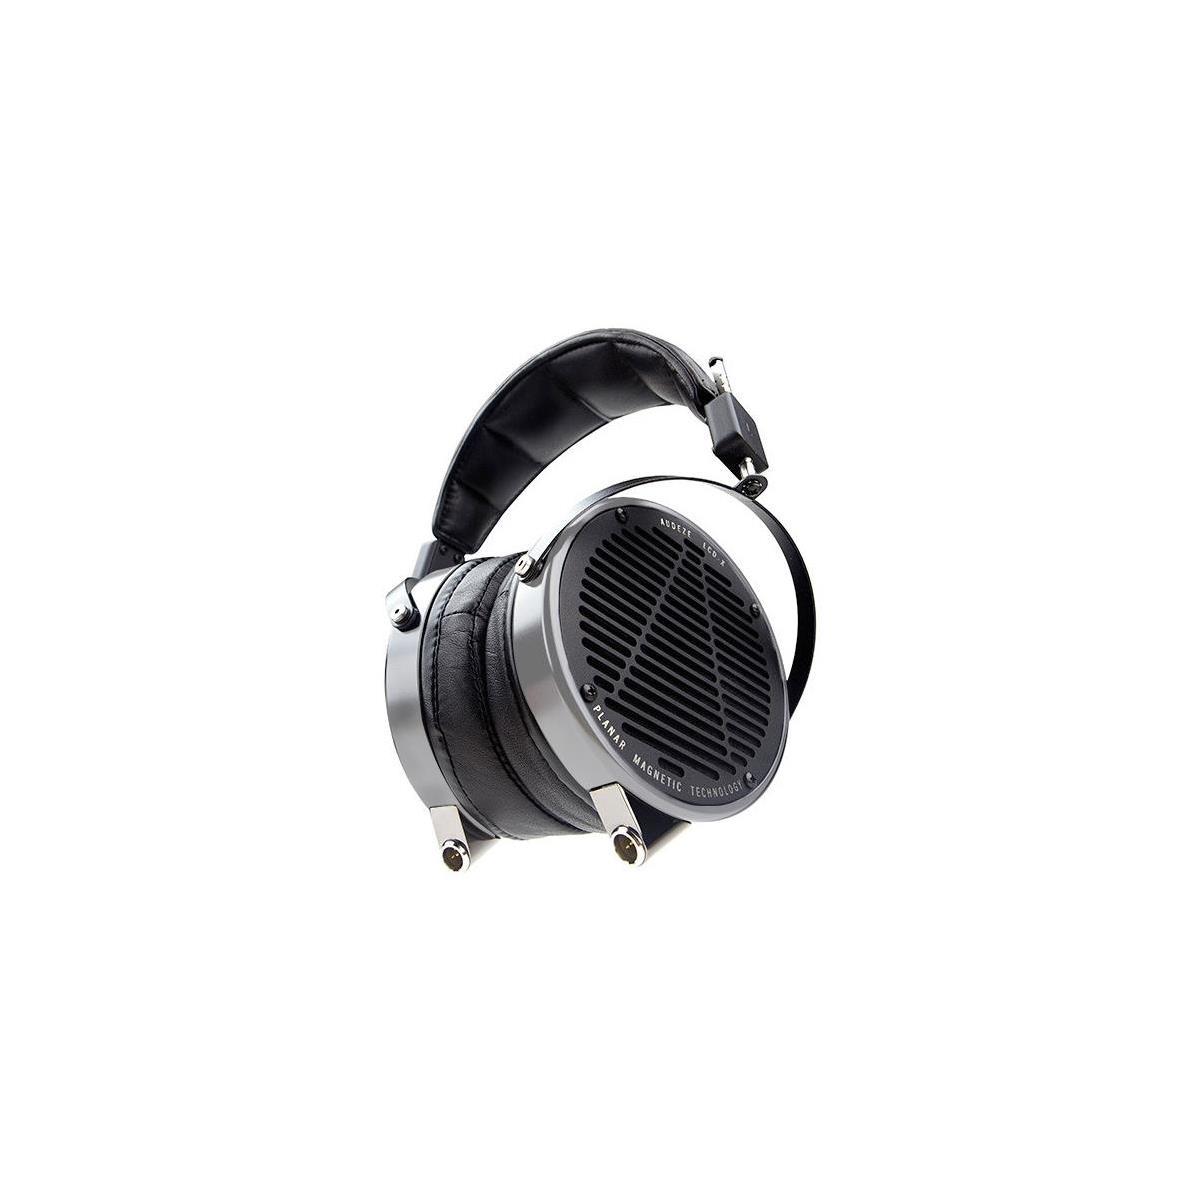 AUDEZE LCD-2 Aliminum Planar Magnetic Headphones $700 + Free shipping